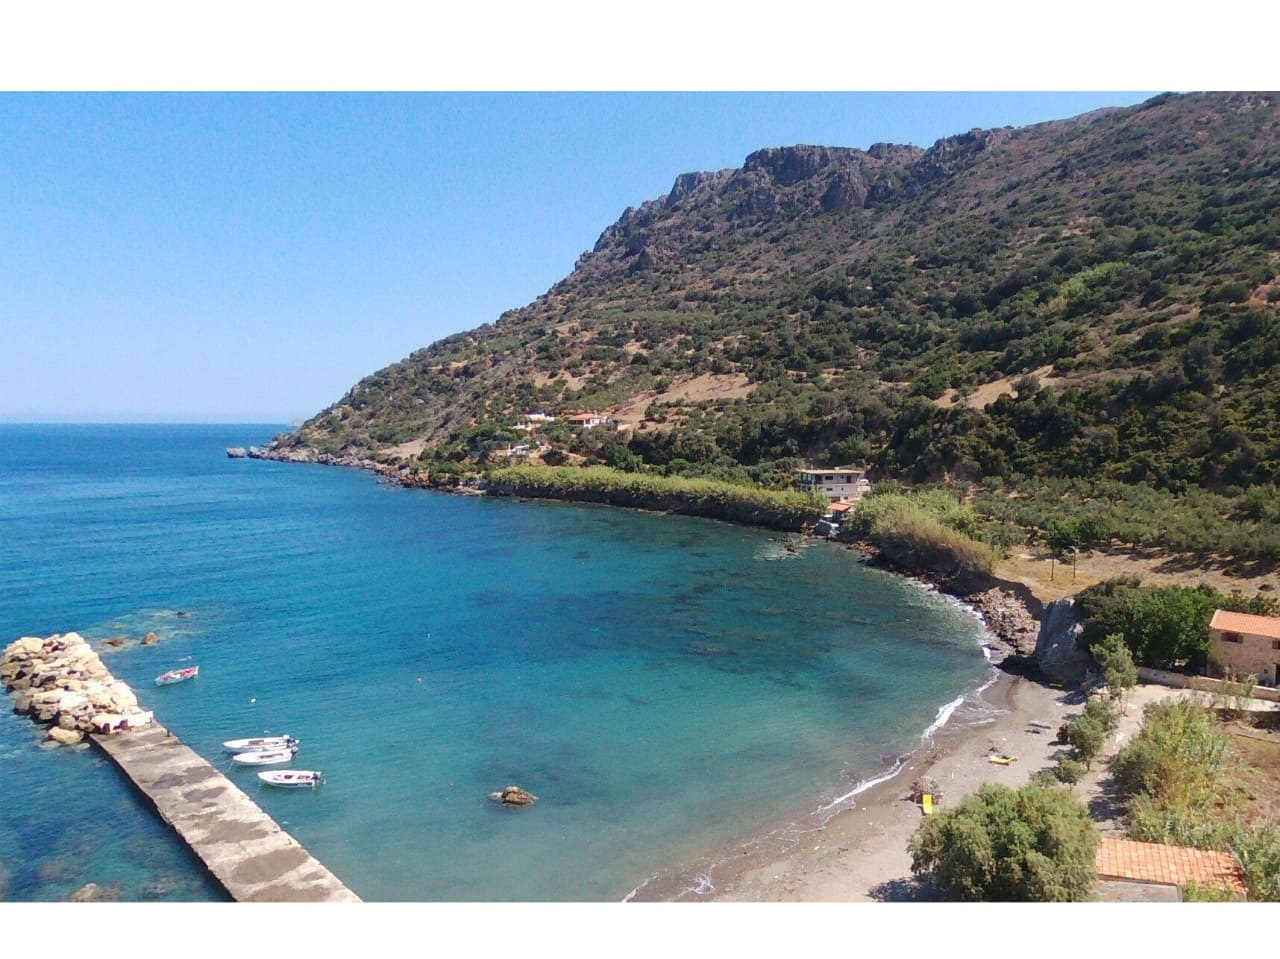 The small port of Ravdoucha and Neratzia Beach